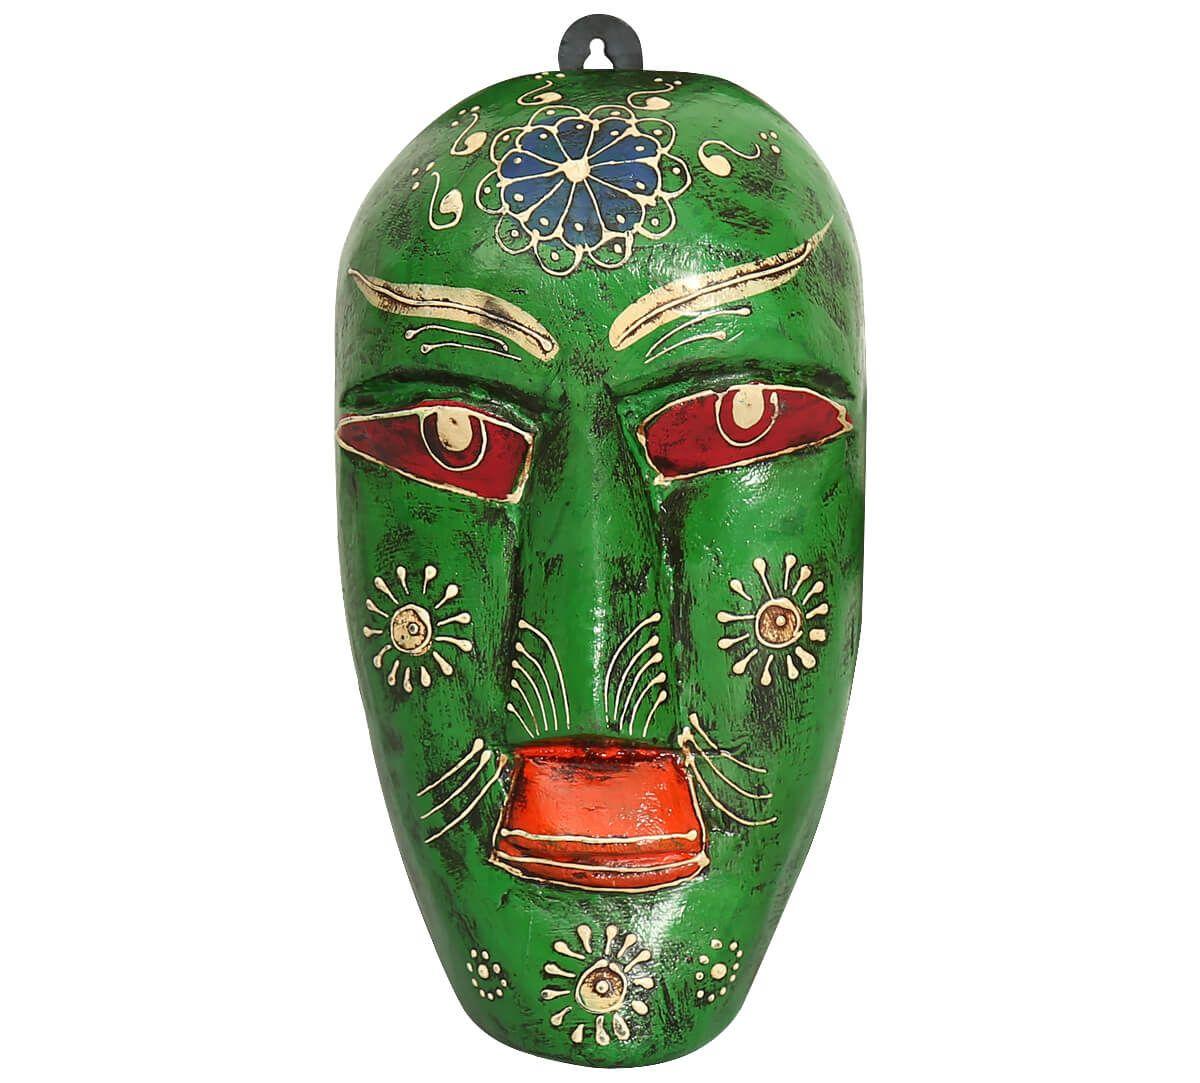 India Circus Olive Hobgoblin Decorative Wooden Mask